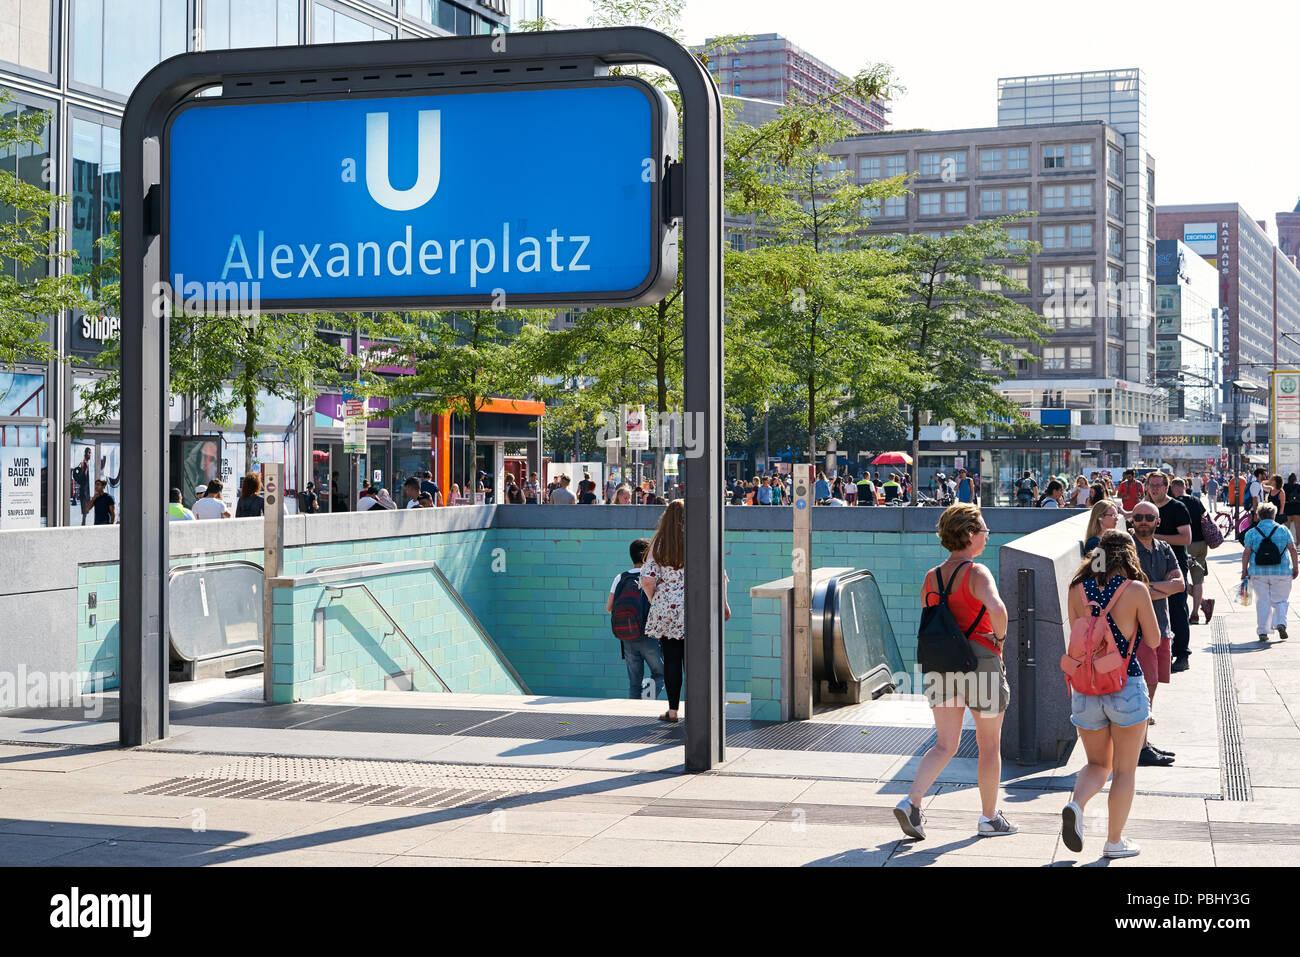 Access to the underground station Alexanderplatz in Berlin Stock Photo